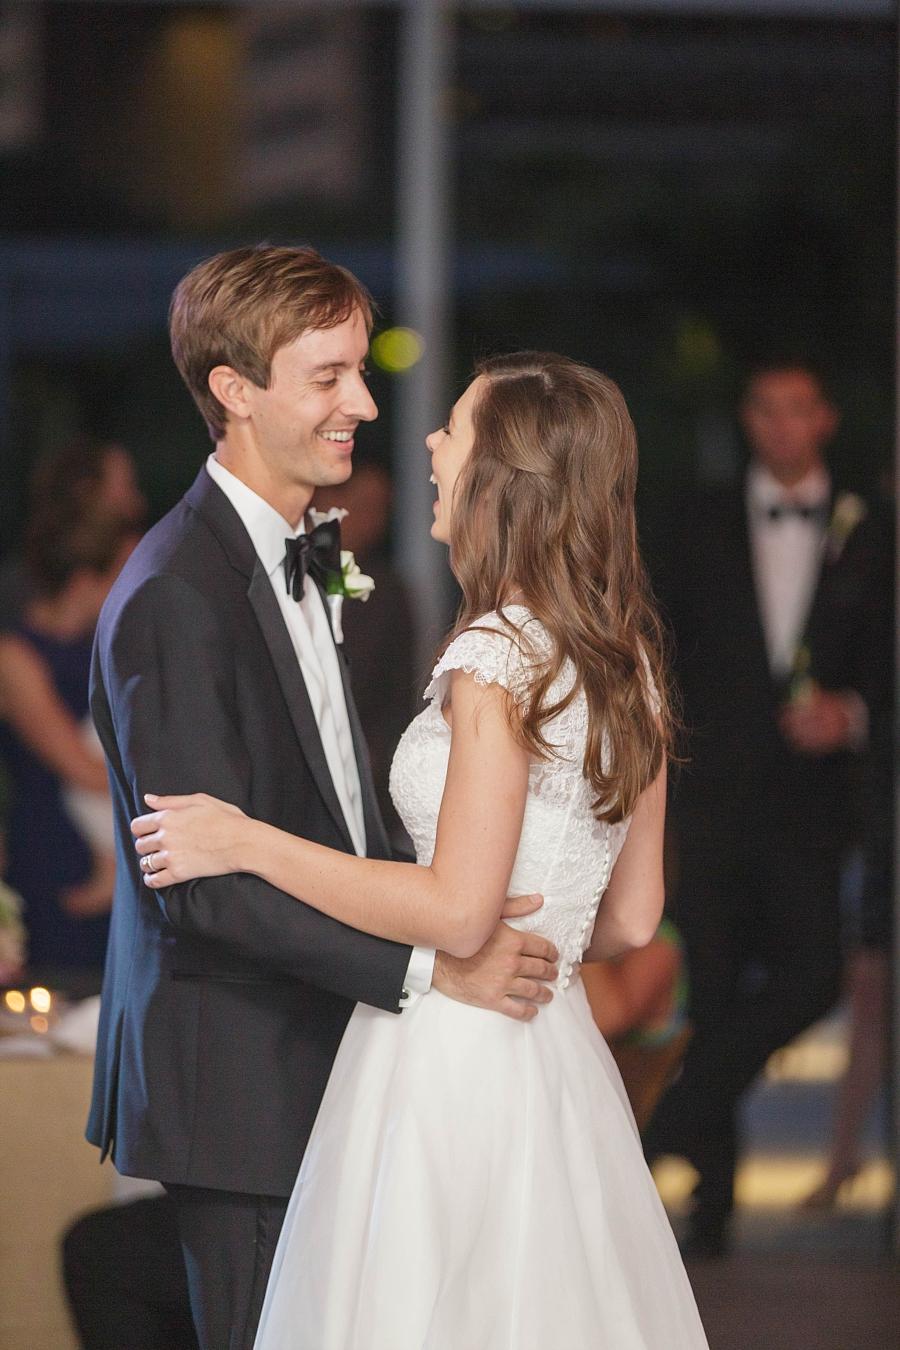 Stacy-Anderson-Photography-McGovern-Centennial-Gardens-Houston-Wedding-Photographer_0074.jpg